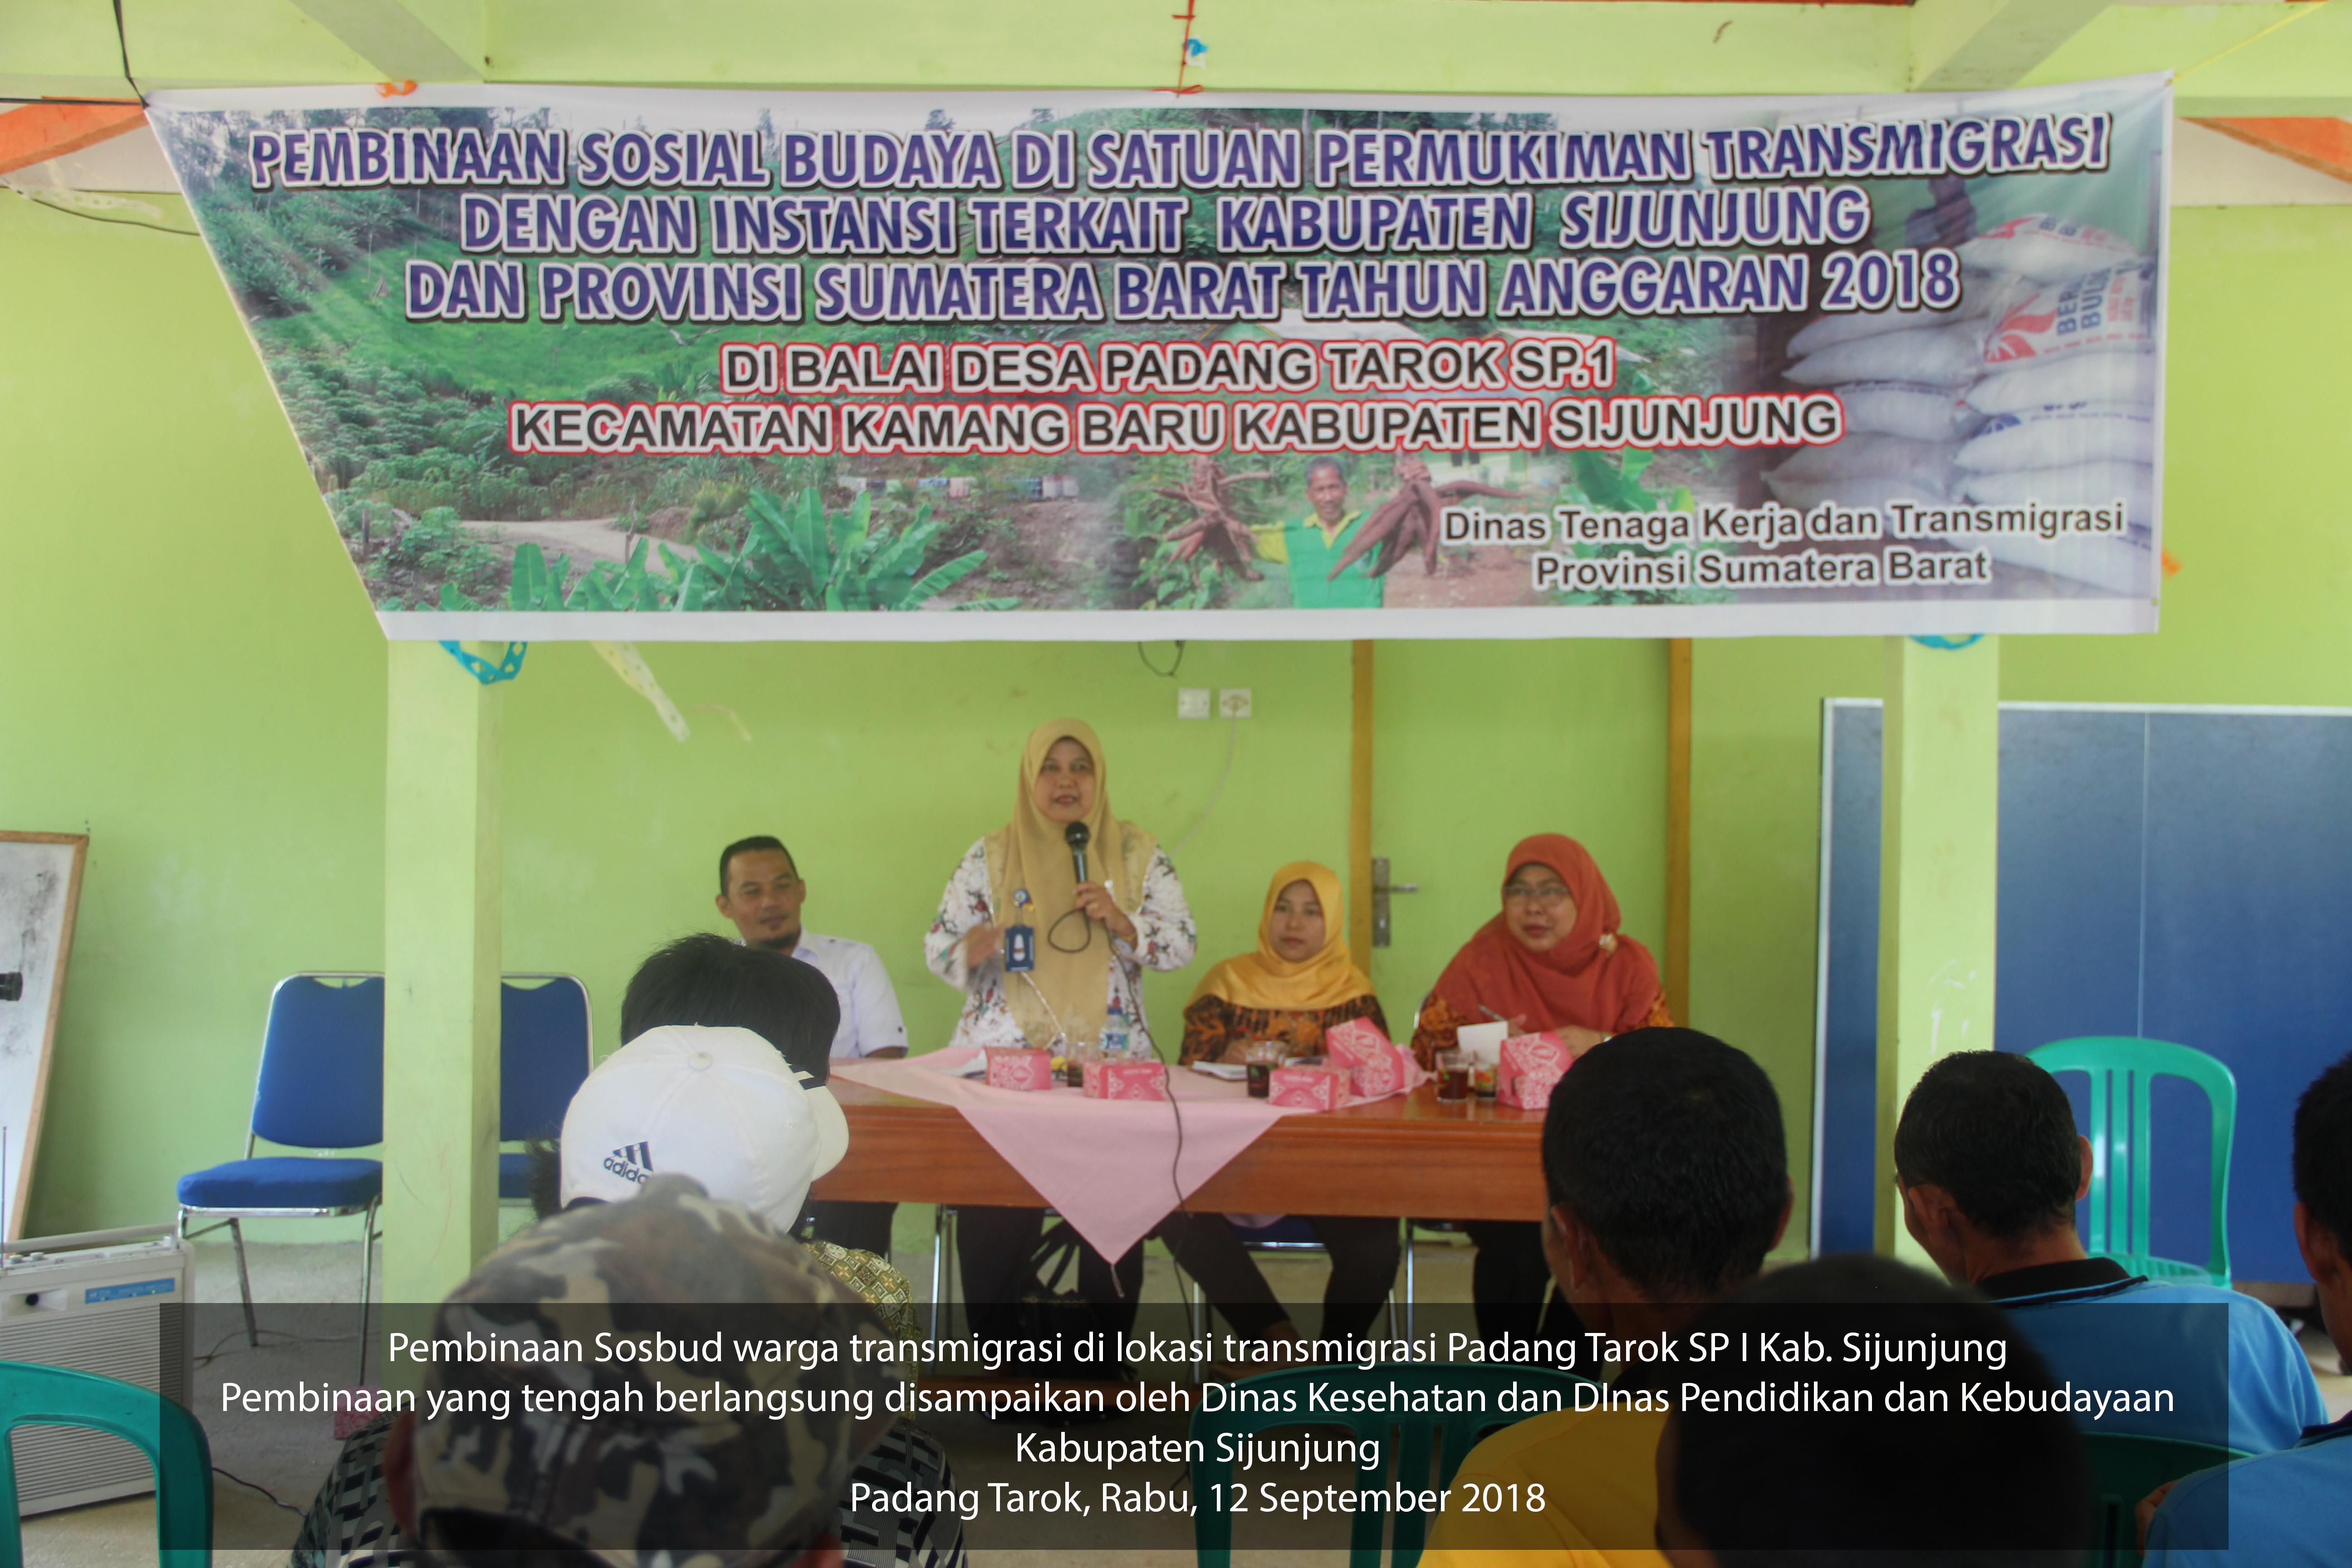 Pembinaan Sosbu warga transmigrasi di Padang Tarok SPI September 2018